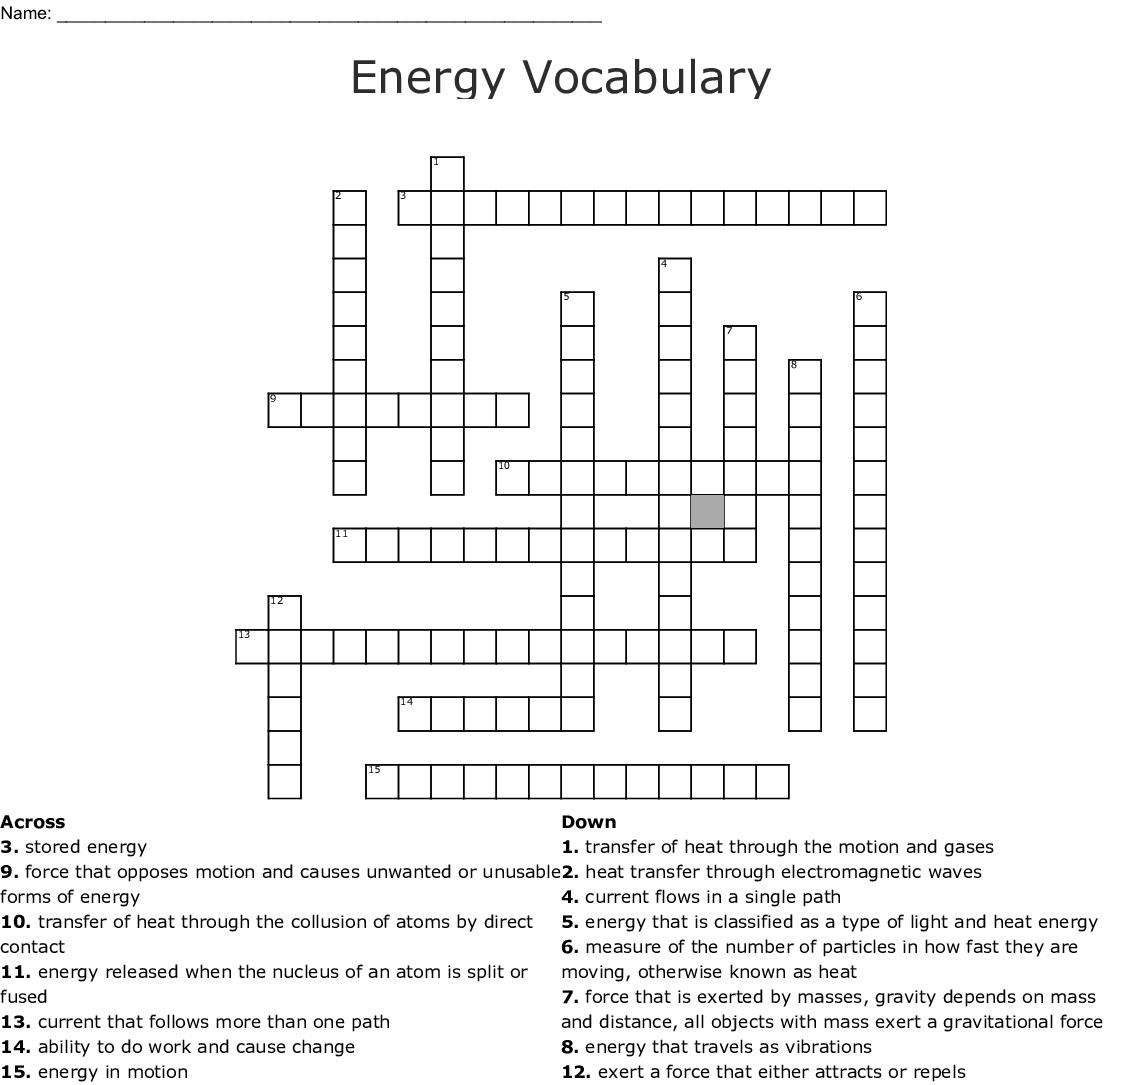 Printables Of Energy Vocabulary Worksheet Answer Key